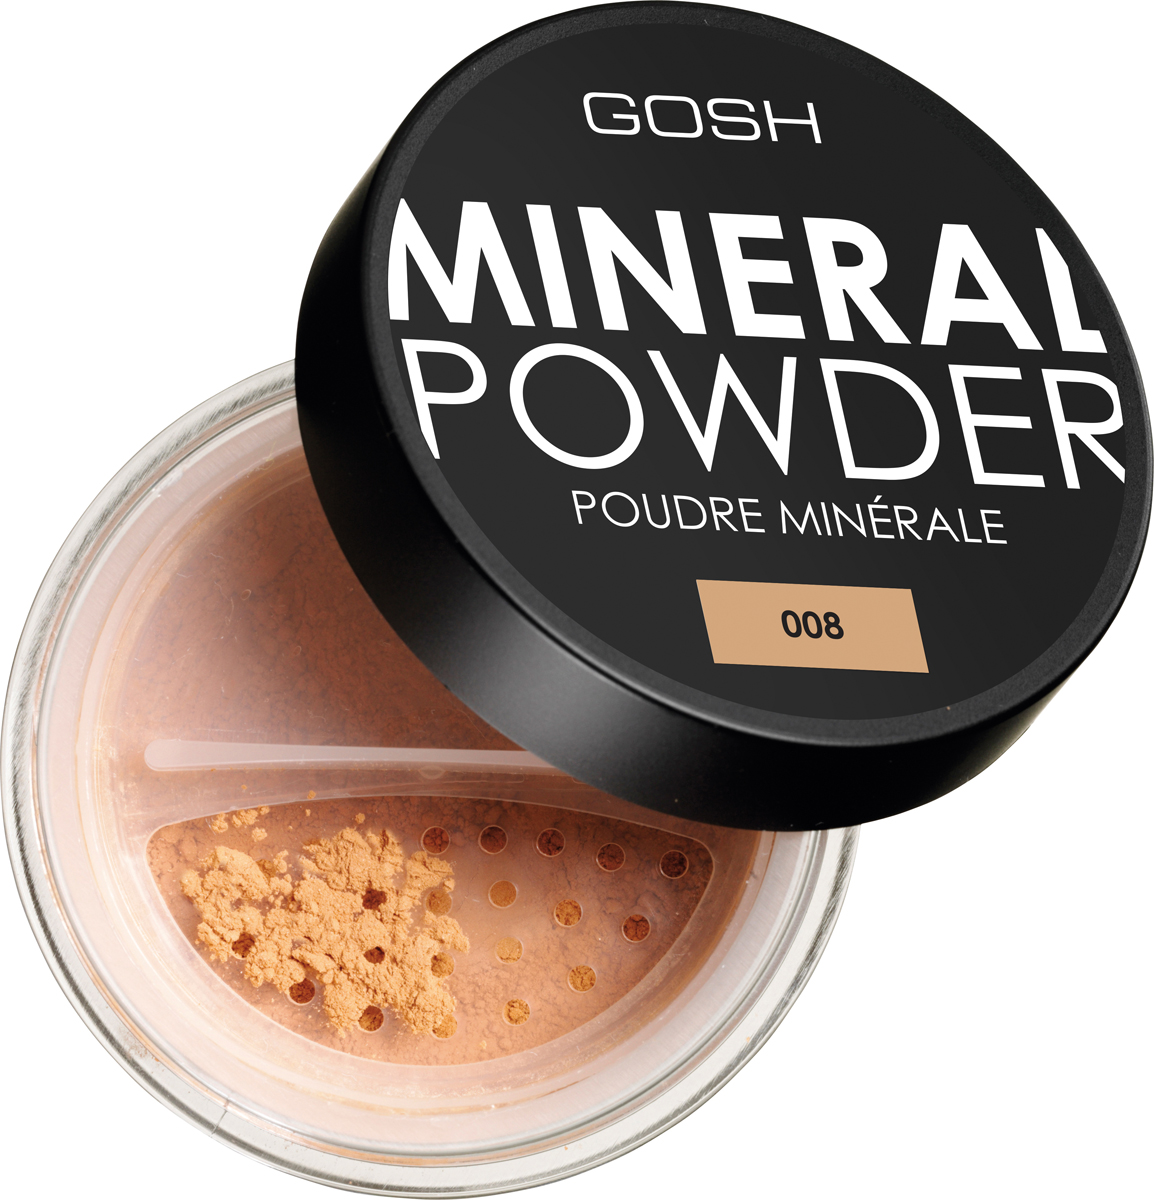 Gosh Пудра рассыпчатая минеральная для лица Mineral Powder, 8 г, тон №008 guerlain meteorites perles пудра для лица в шариках 2 розово бежевый